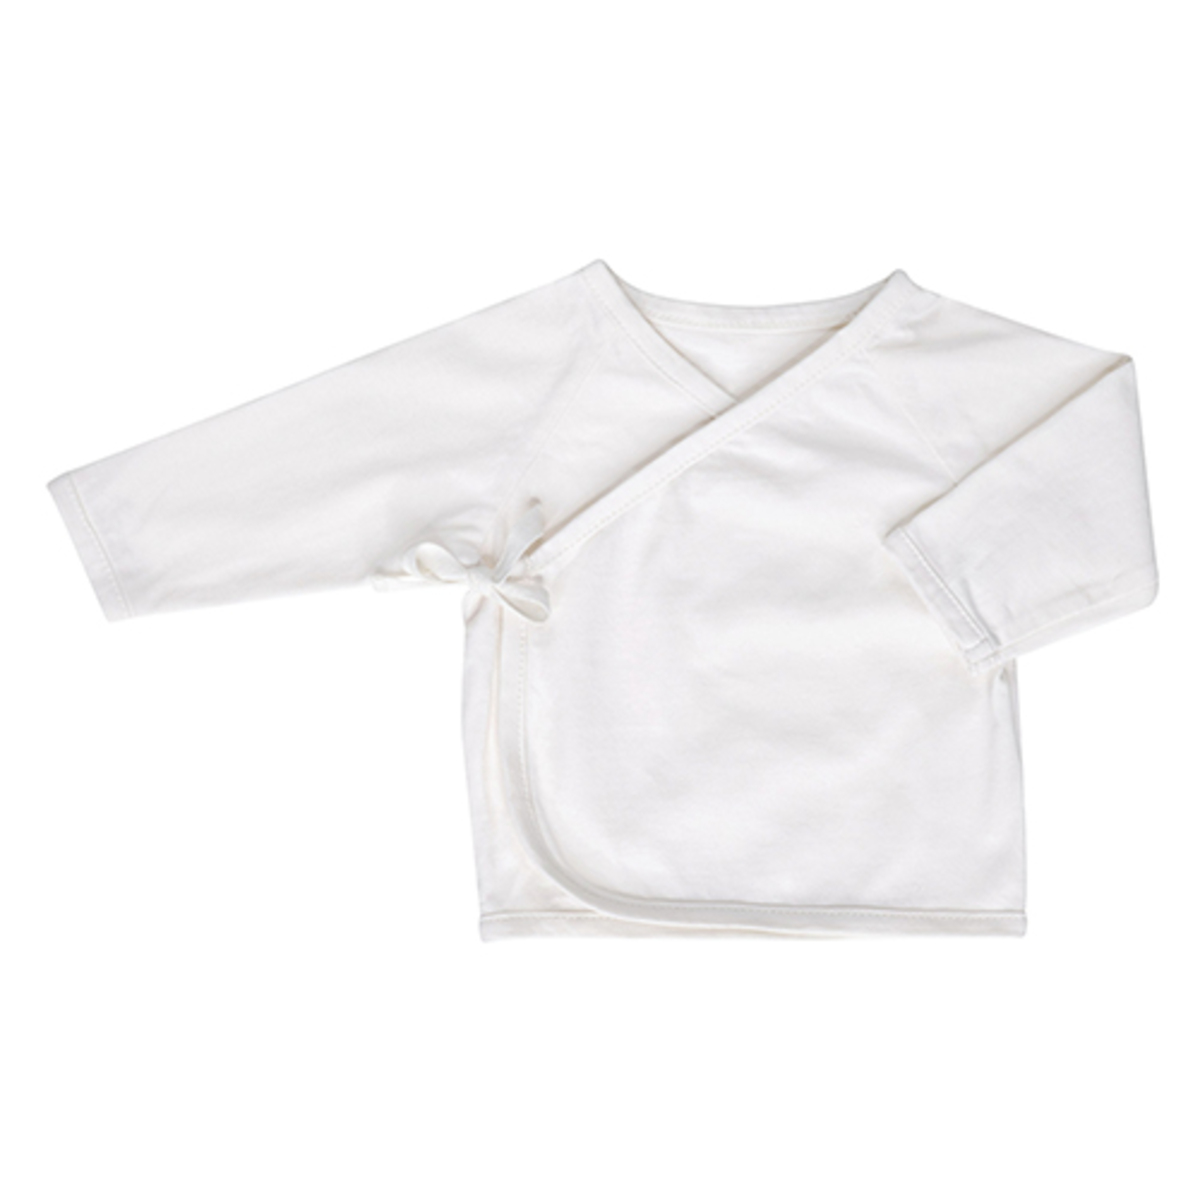 Haut bébé Cardigan Kimono Cream - 1 Mois